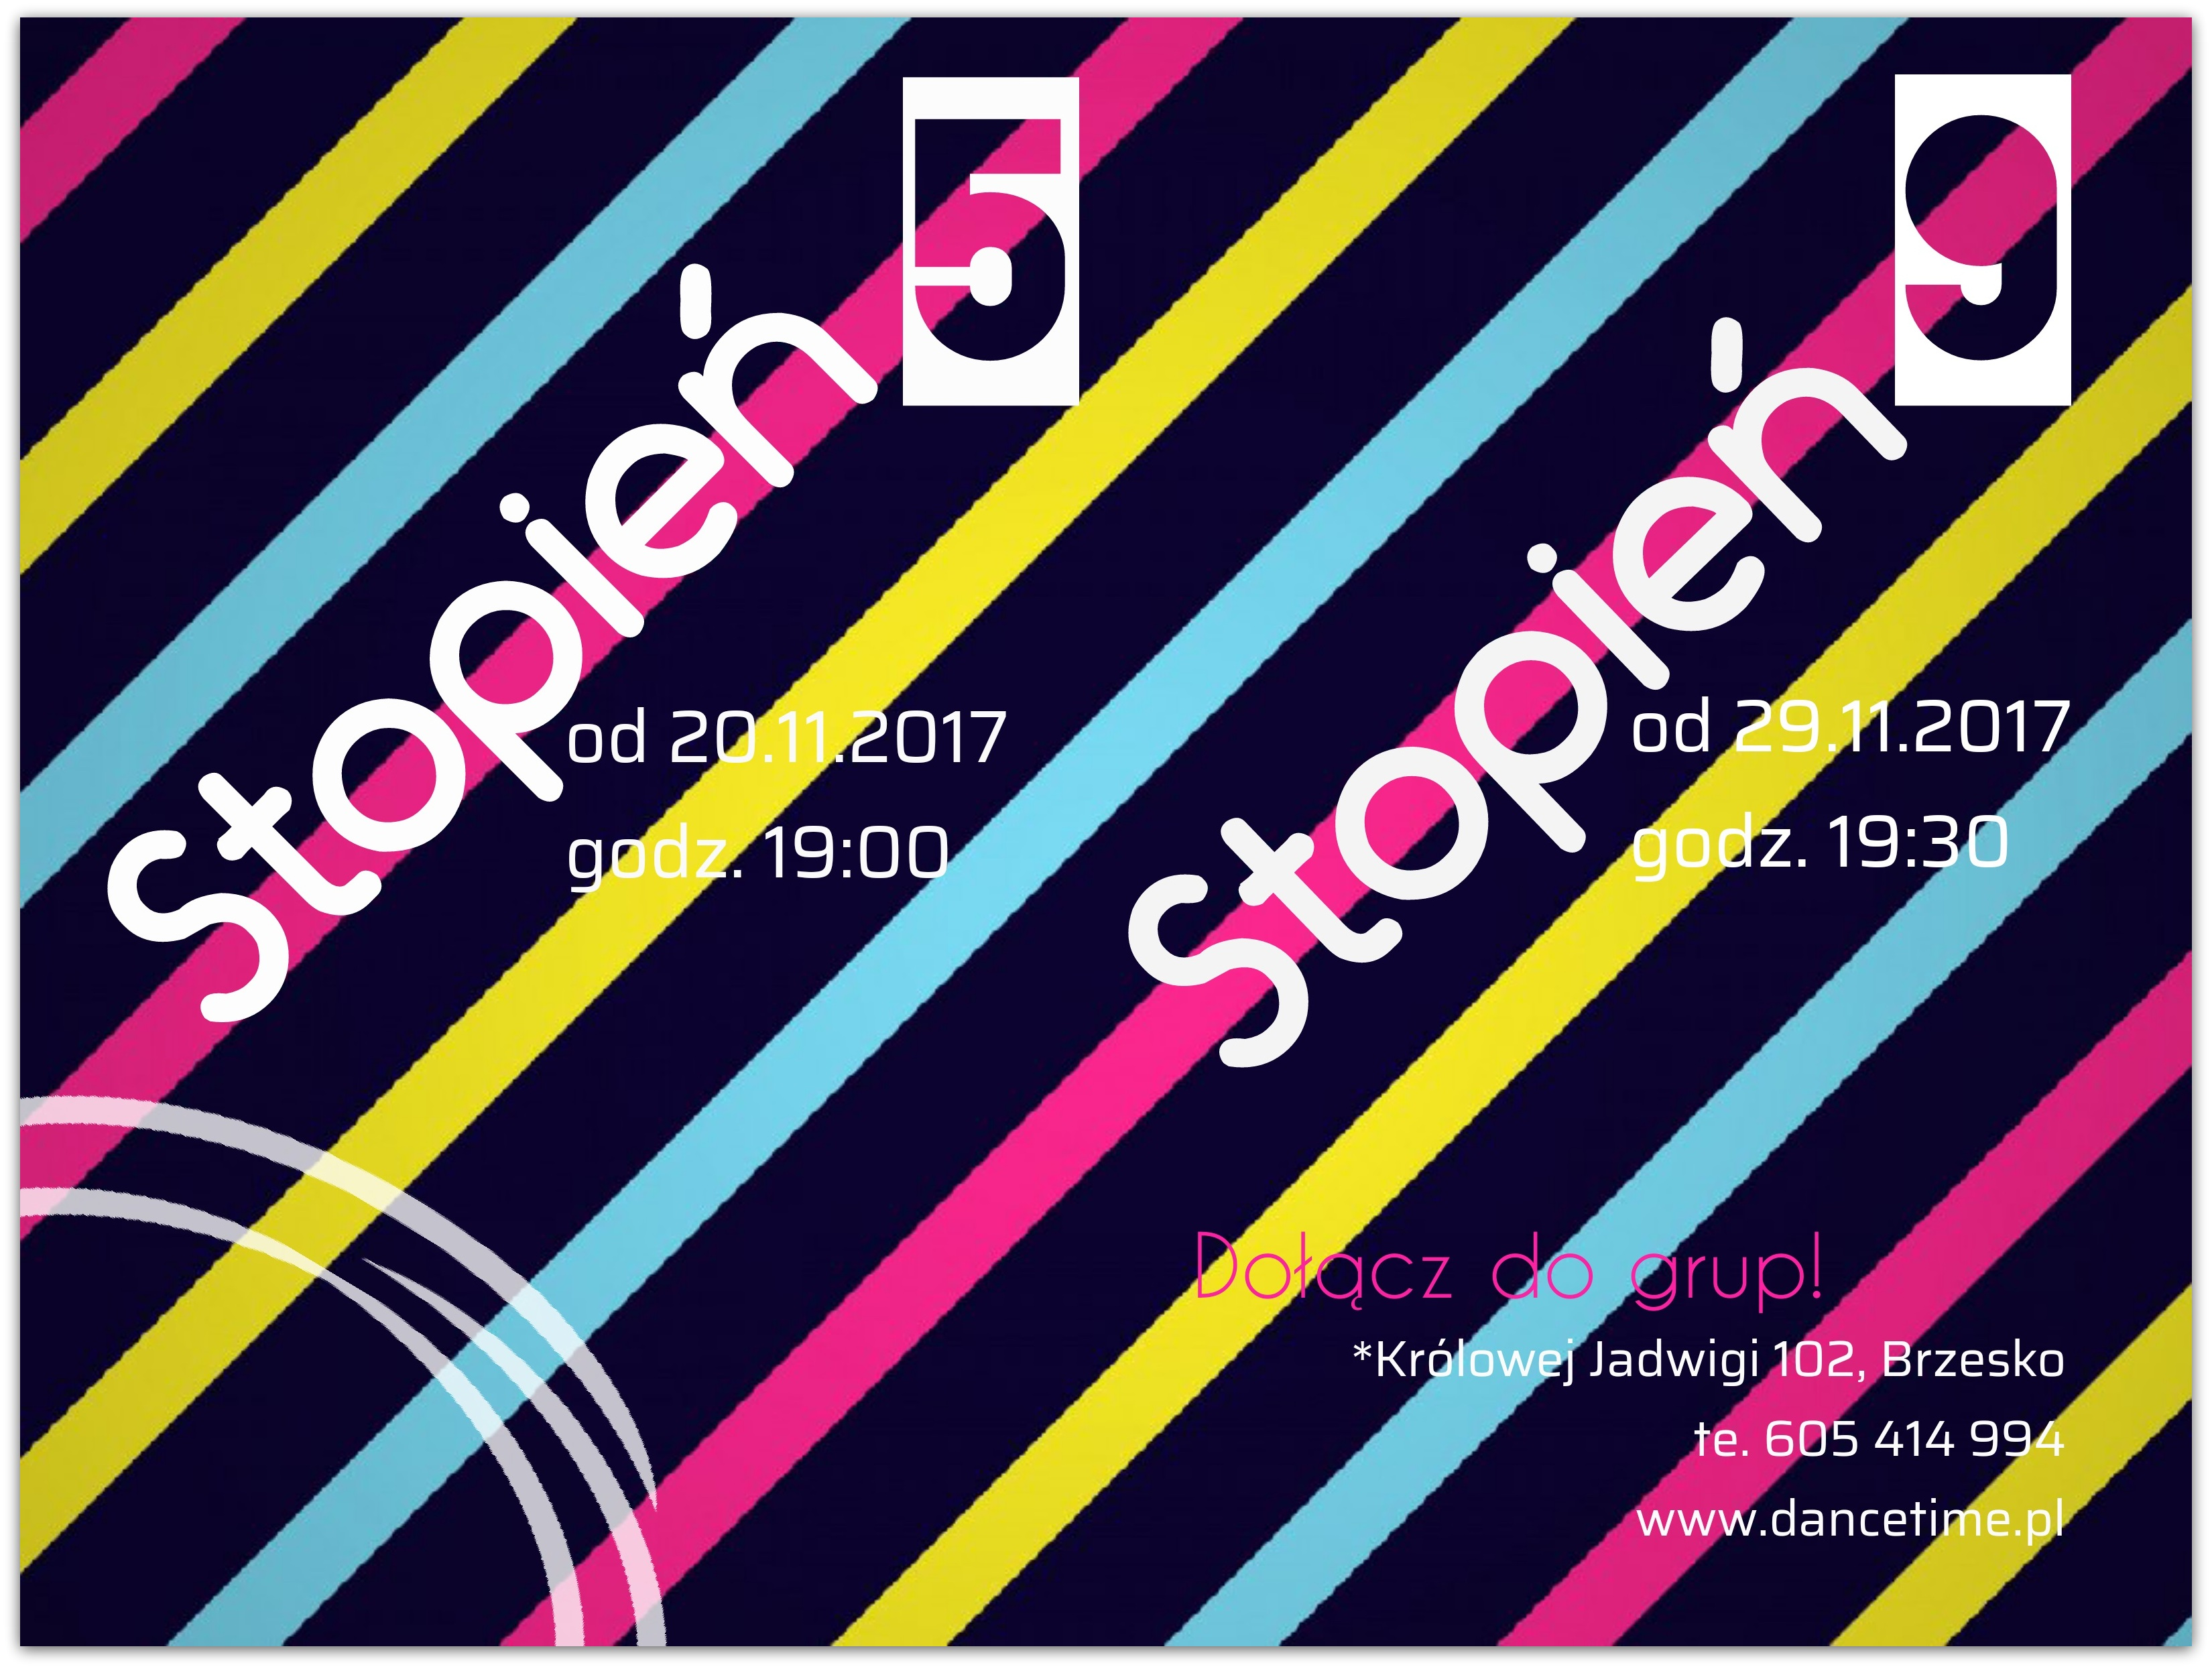 PosterMaker-1511175538717 — kopia